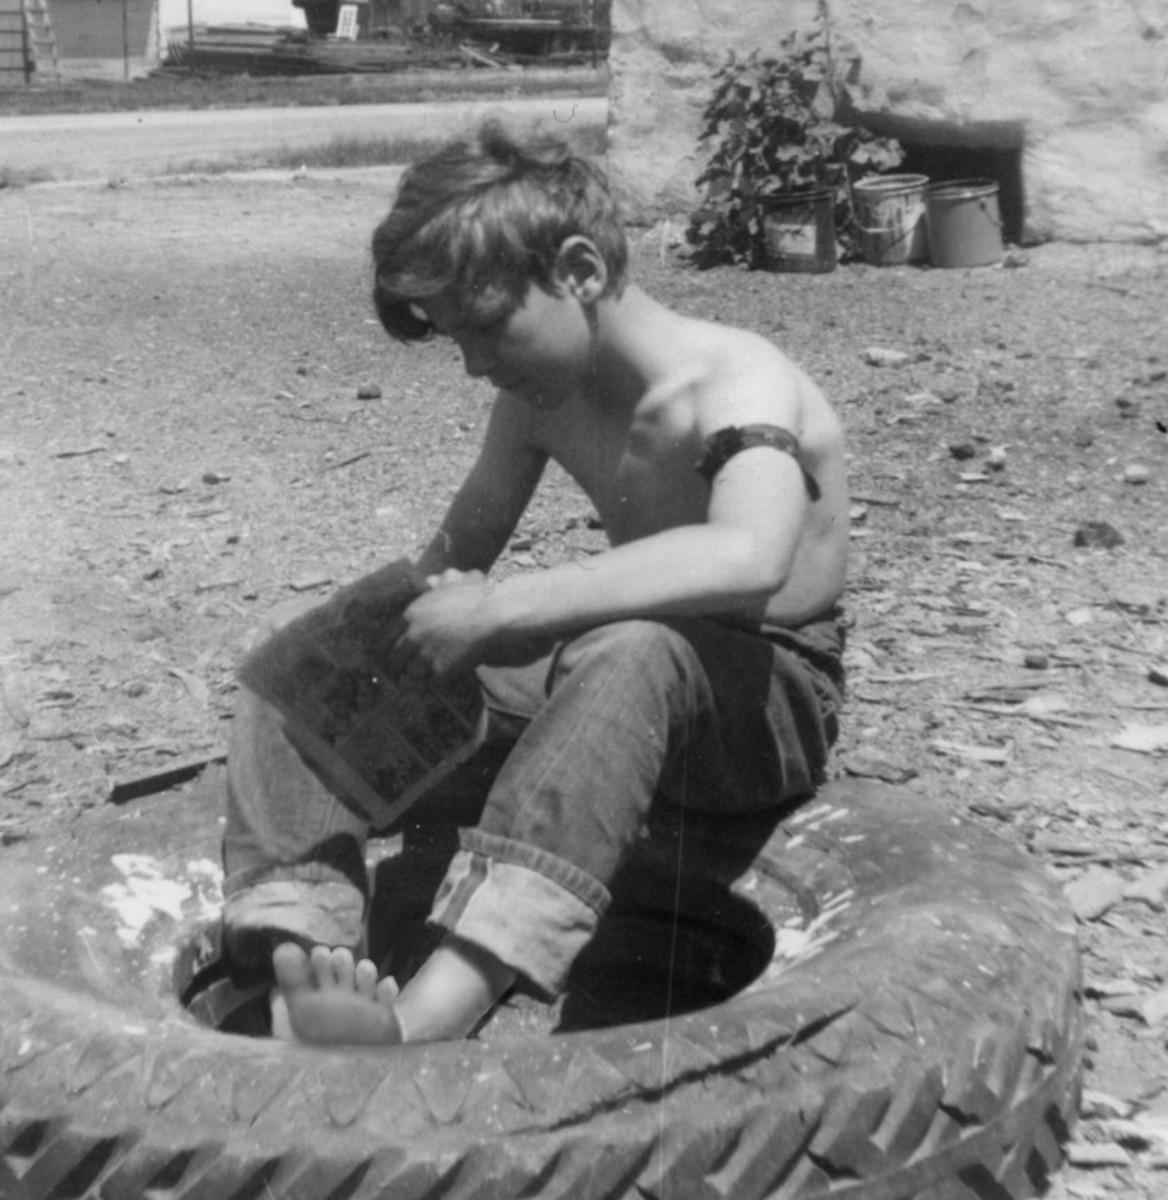 Barefoot Boys - A Poem